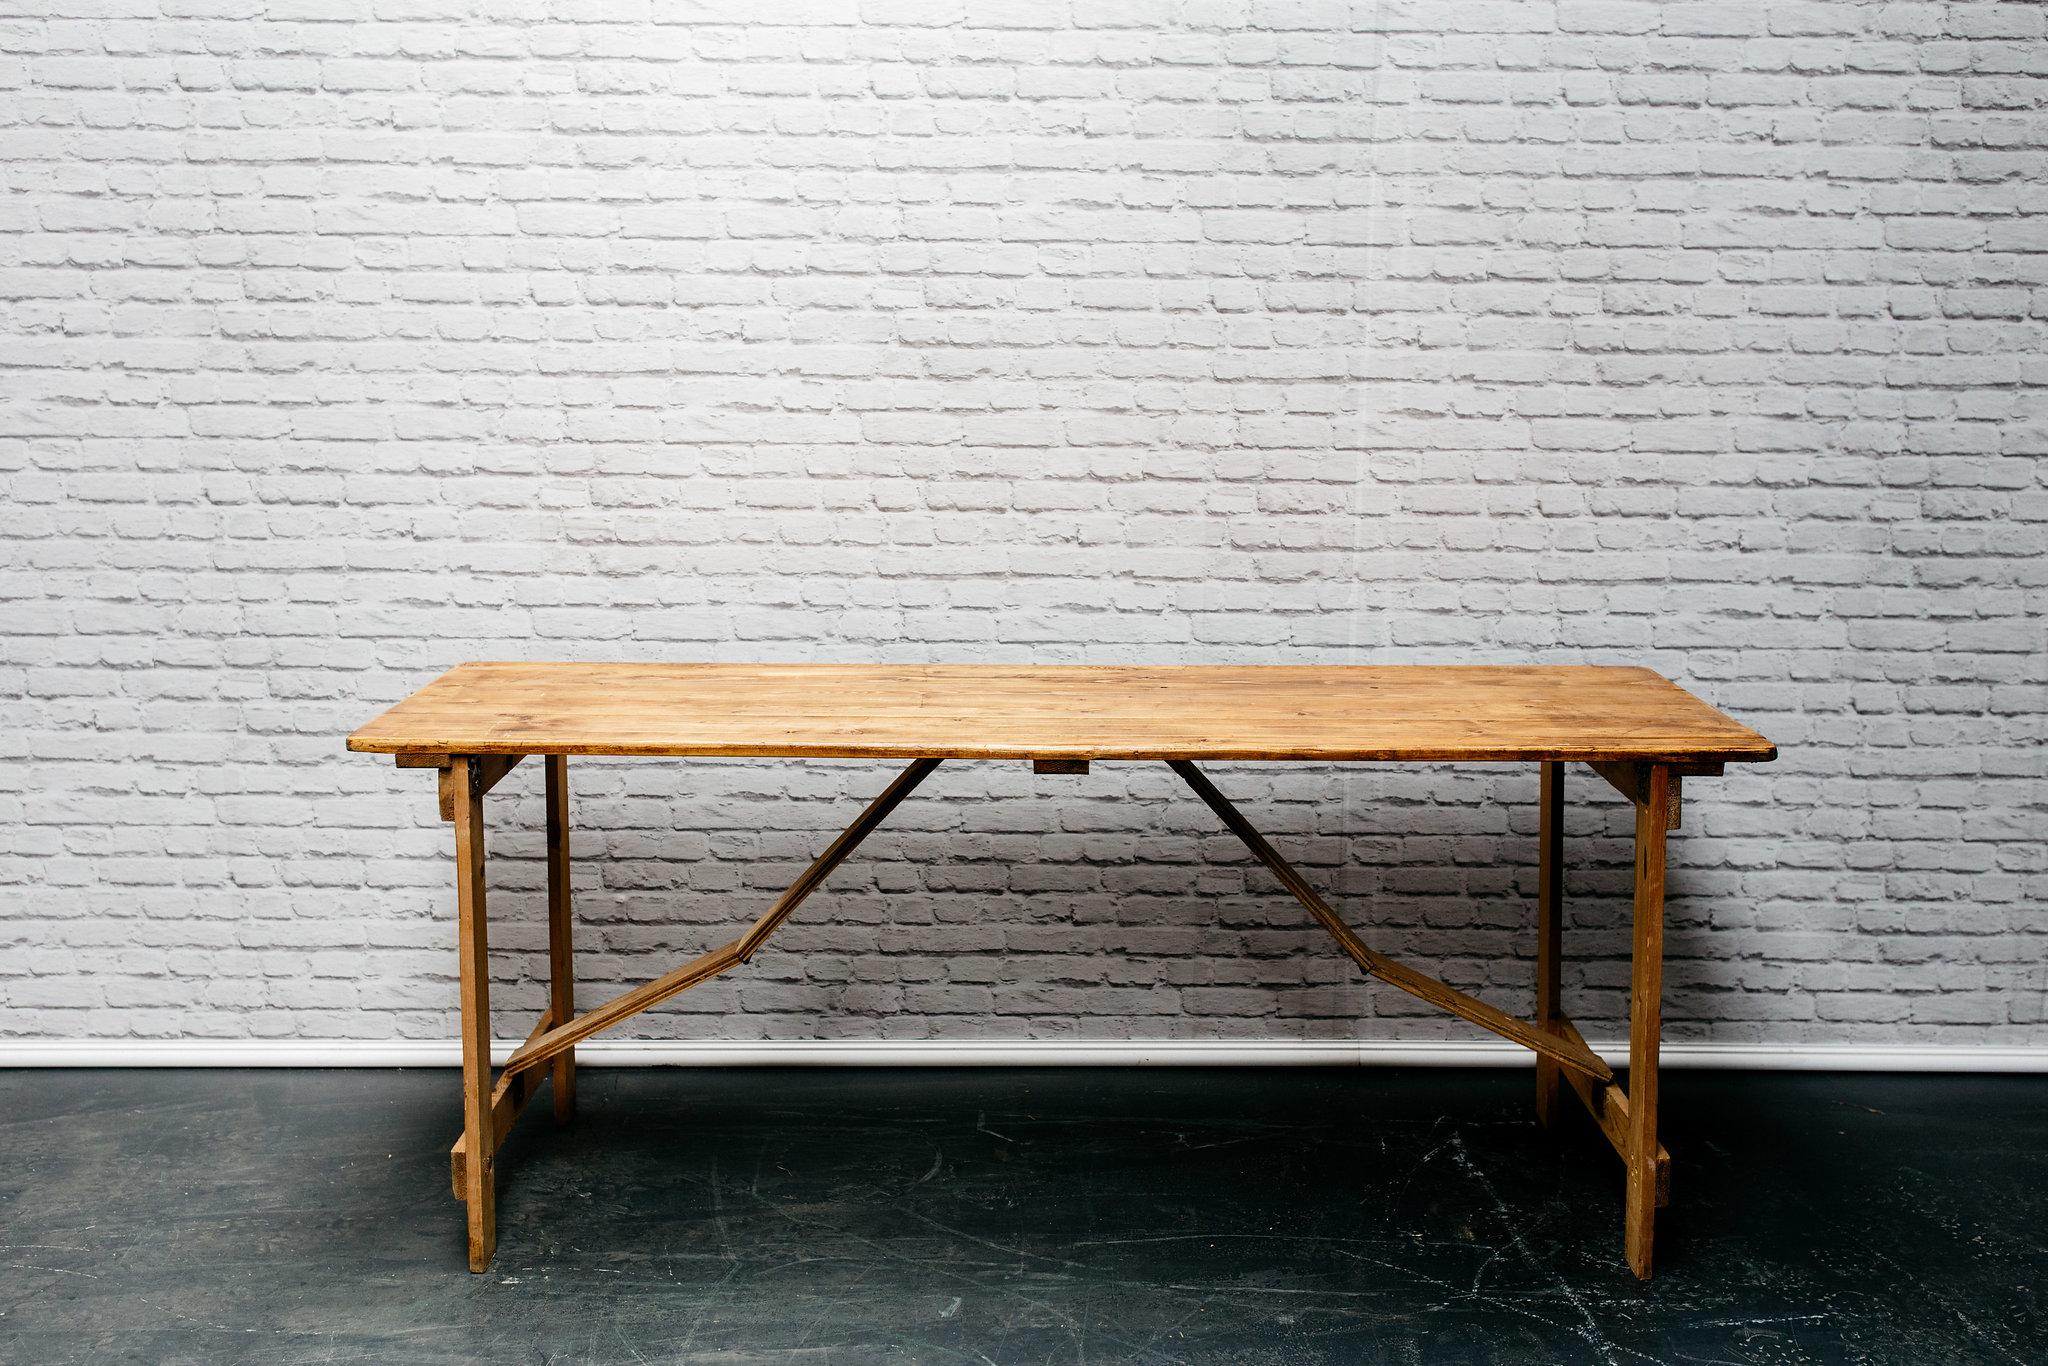 6ft Vintage Style Trestle Table